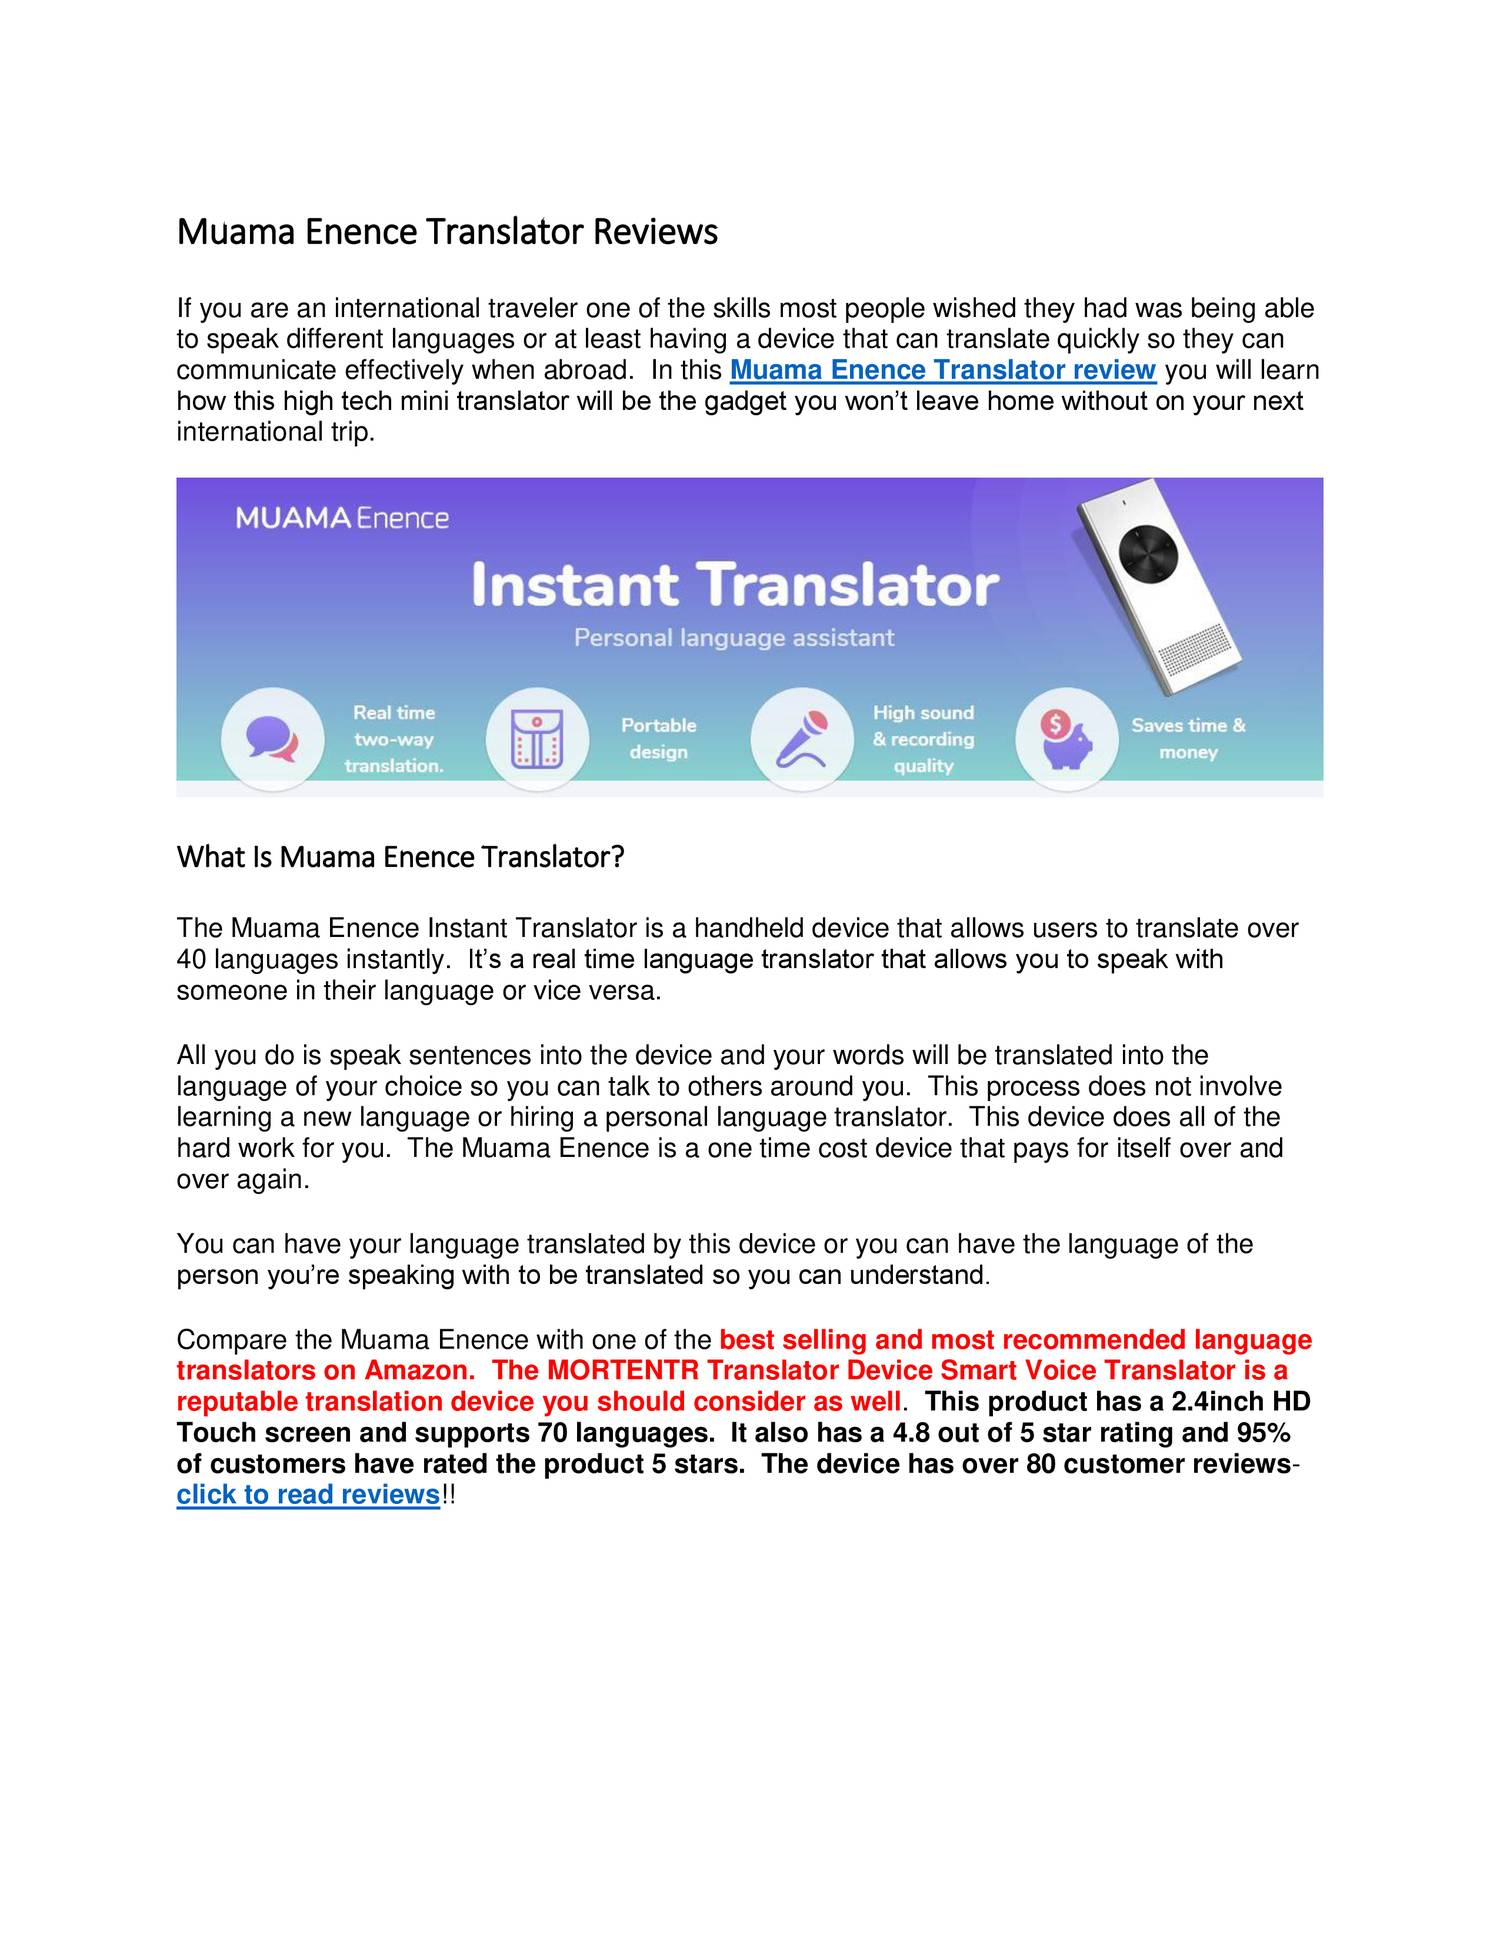 Muama Enence Translator Reviews docx   DocDroid